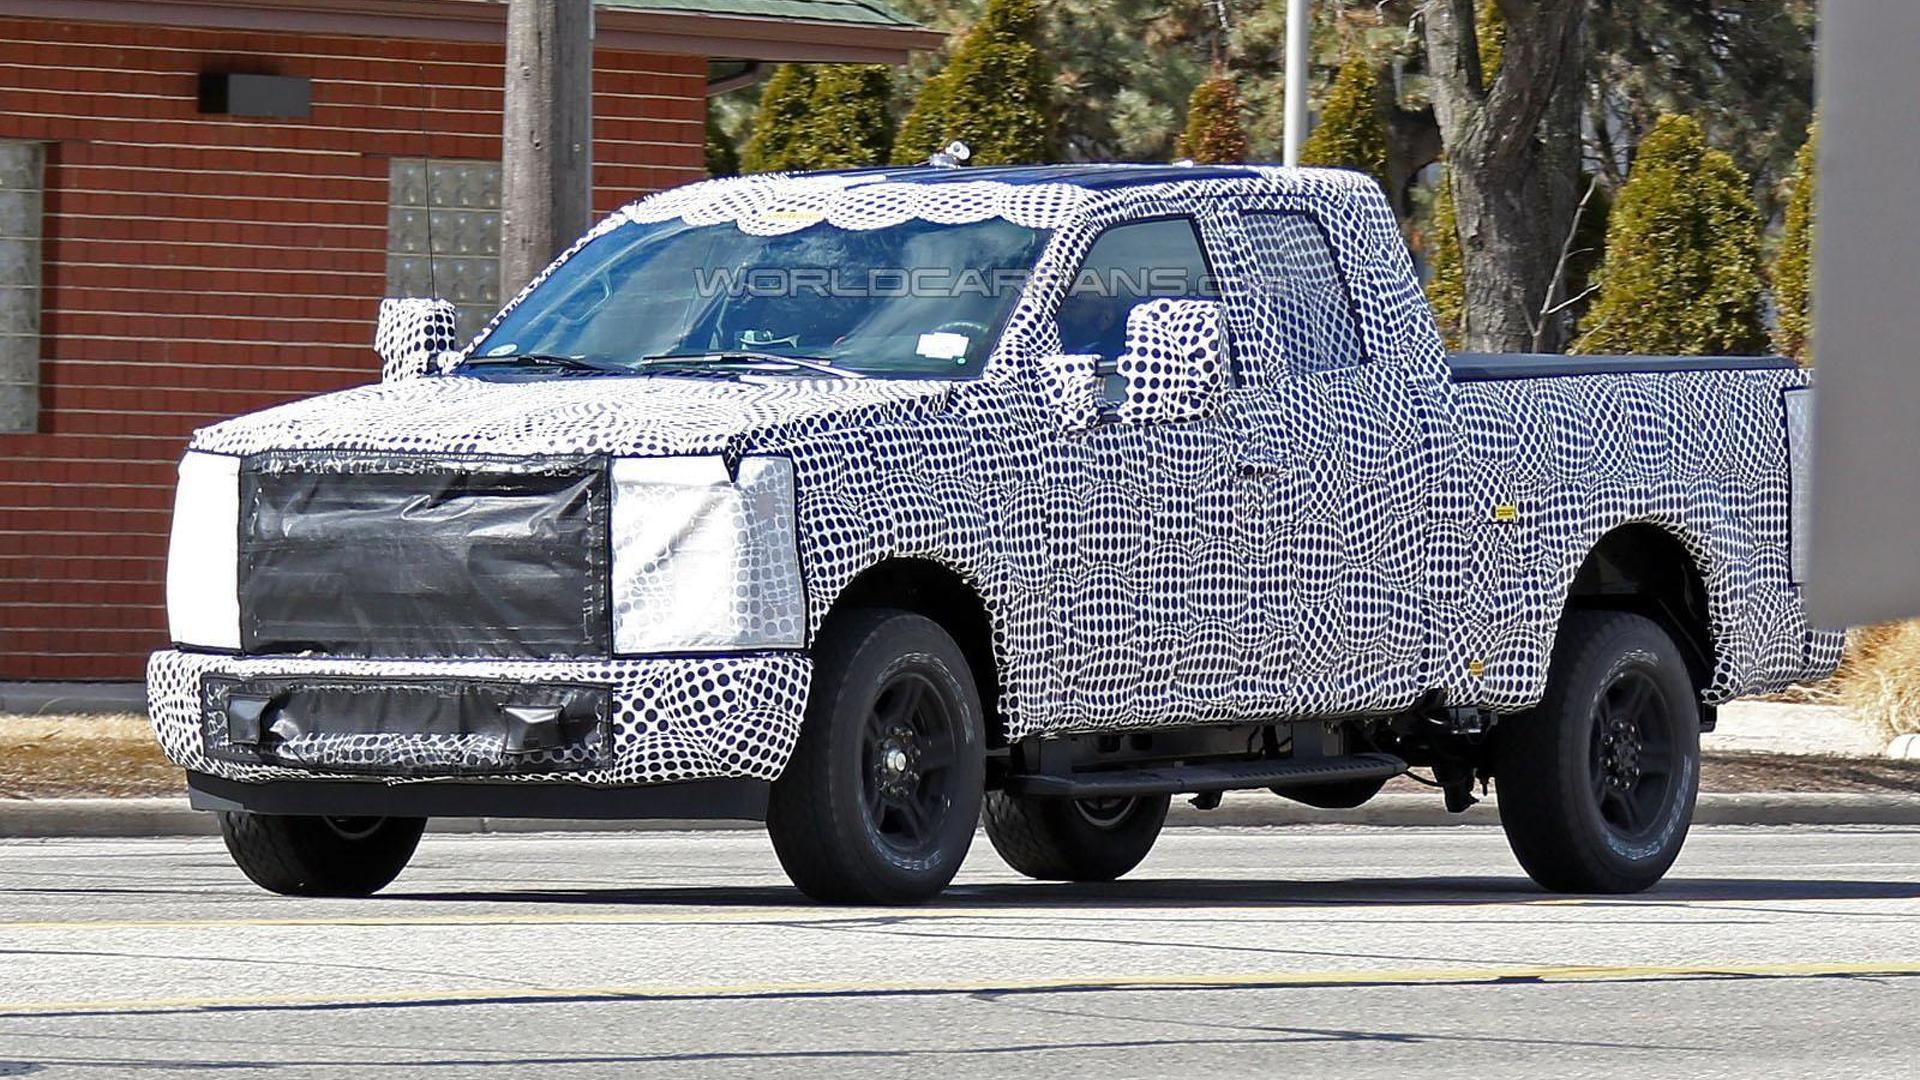 Several new Ford Super Duty trucks spied in Michigan